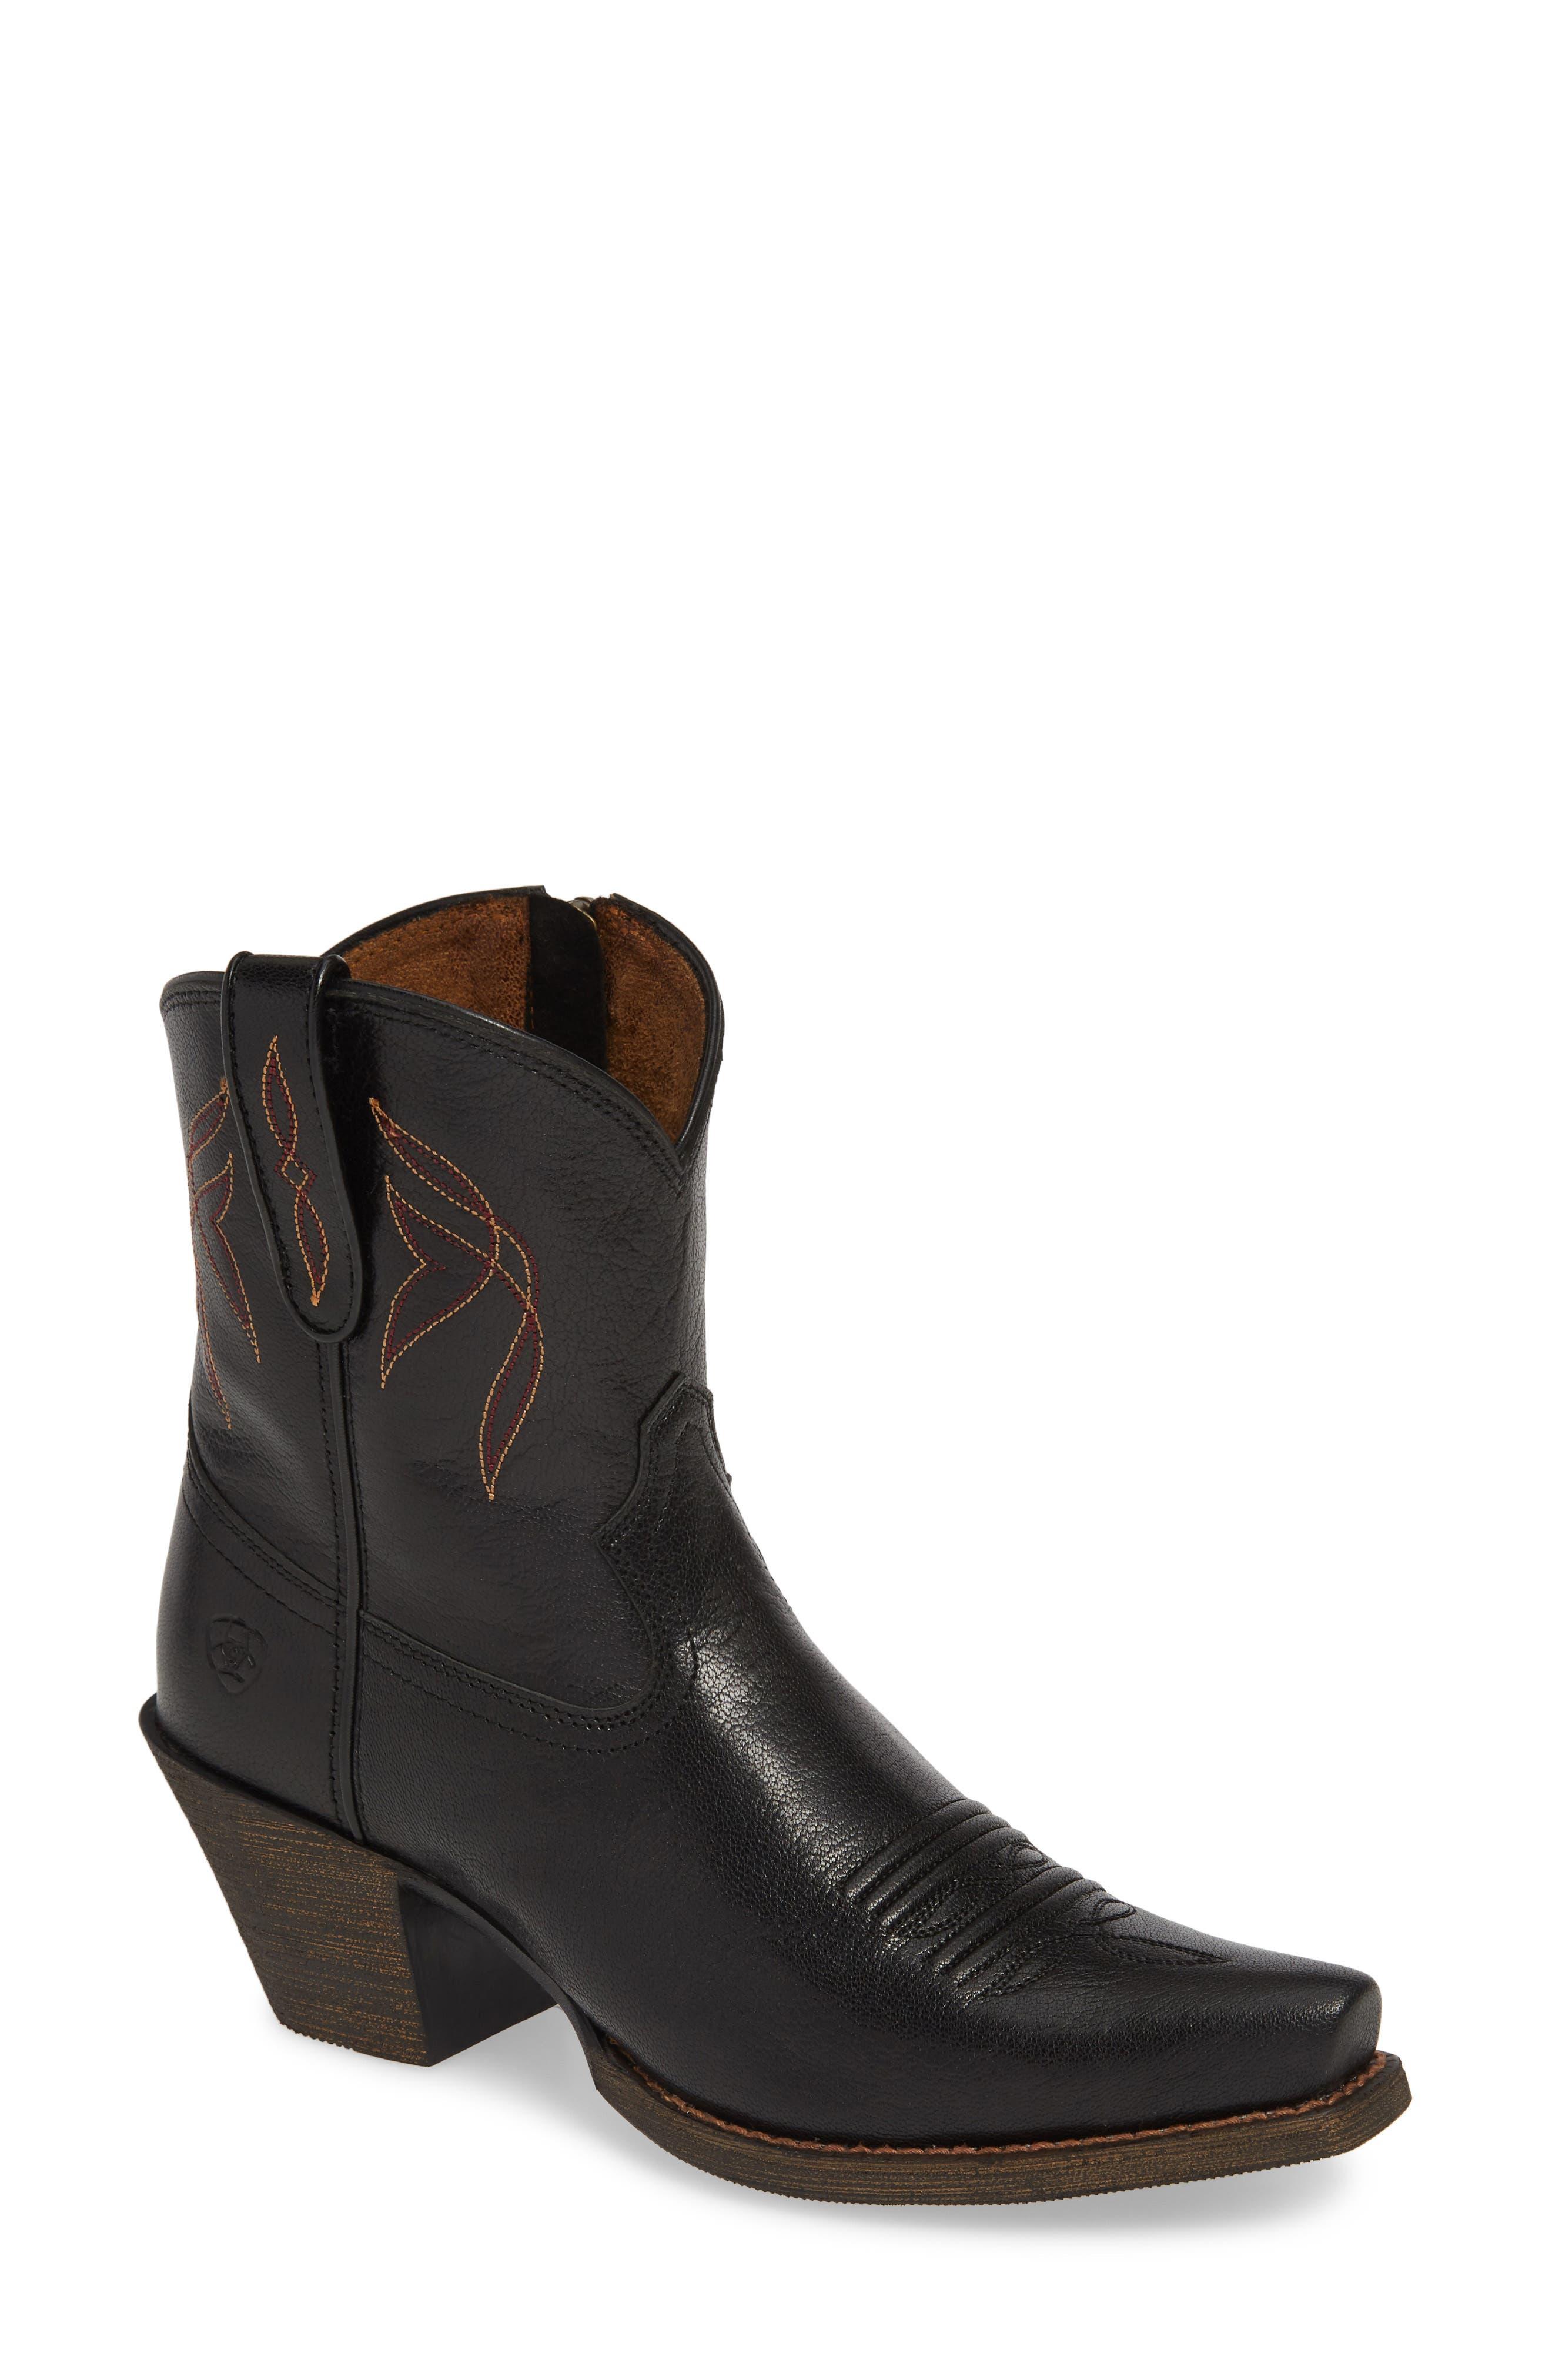 Ariat Lovely Western Boot, Black